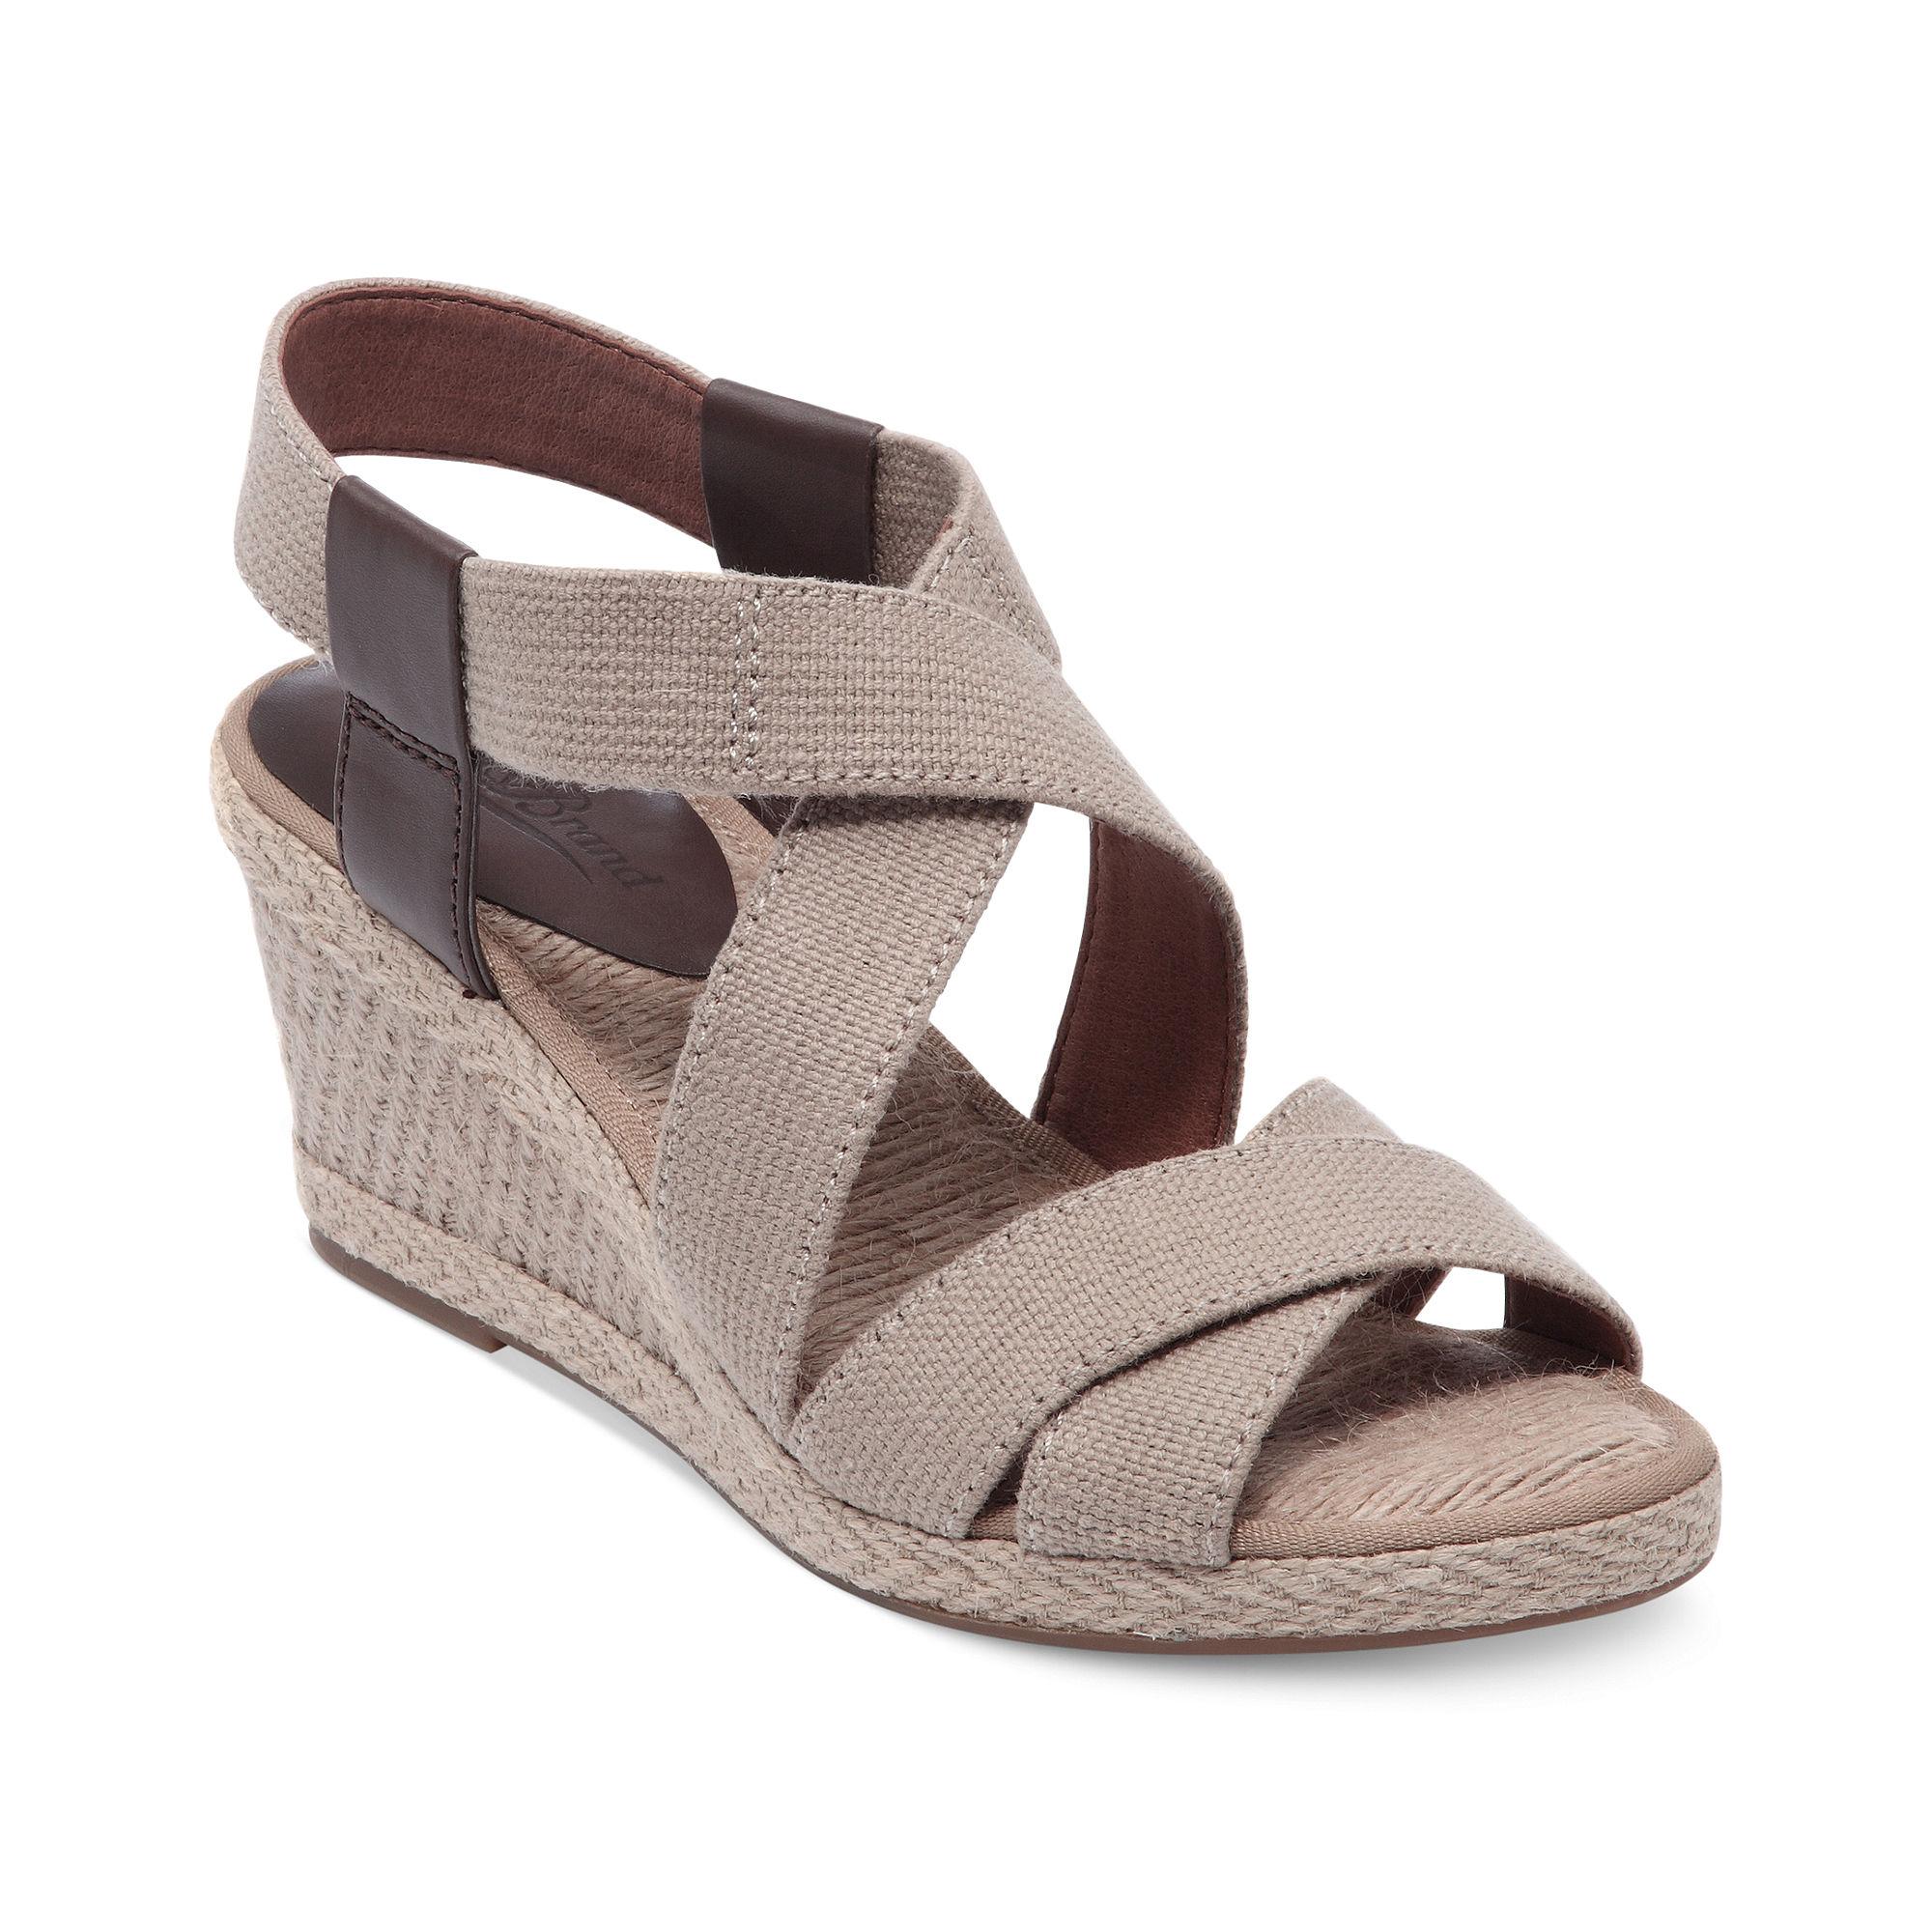 Lucky Brand Keane Platform Wedge Sandals In Beige (khaki)   Lyst